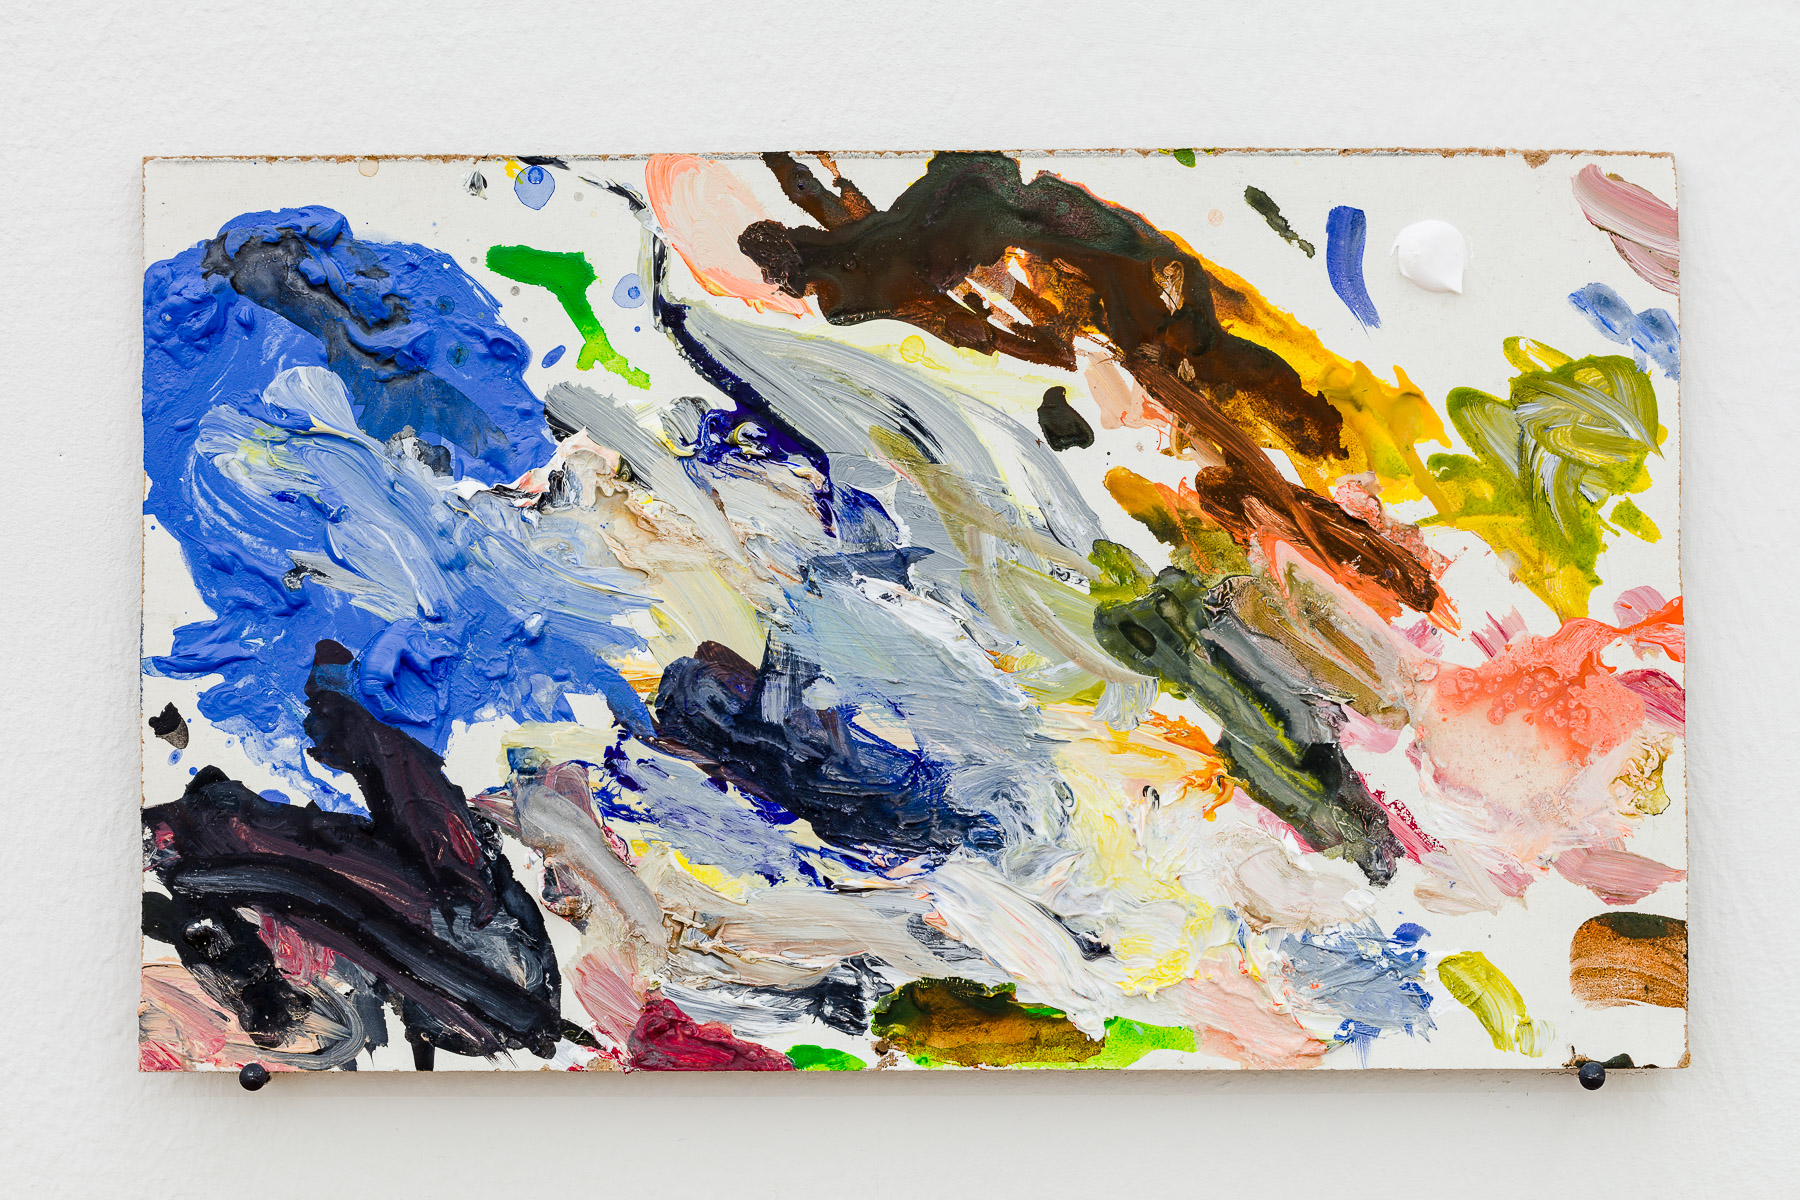 2019_05_20_Elke-Krystufek_Croy-Nielsen_by-kunst-dokumentation-com_009_web.jpg